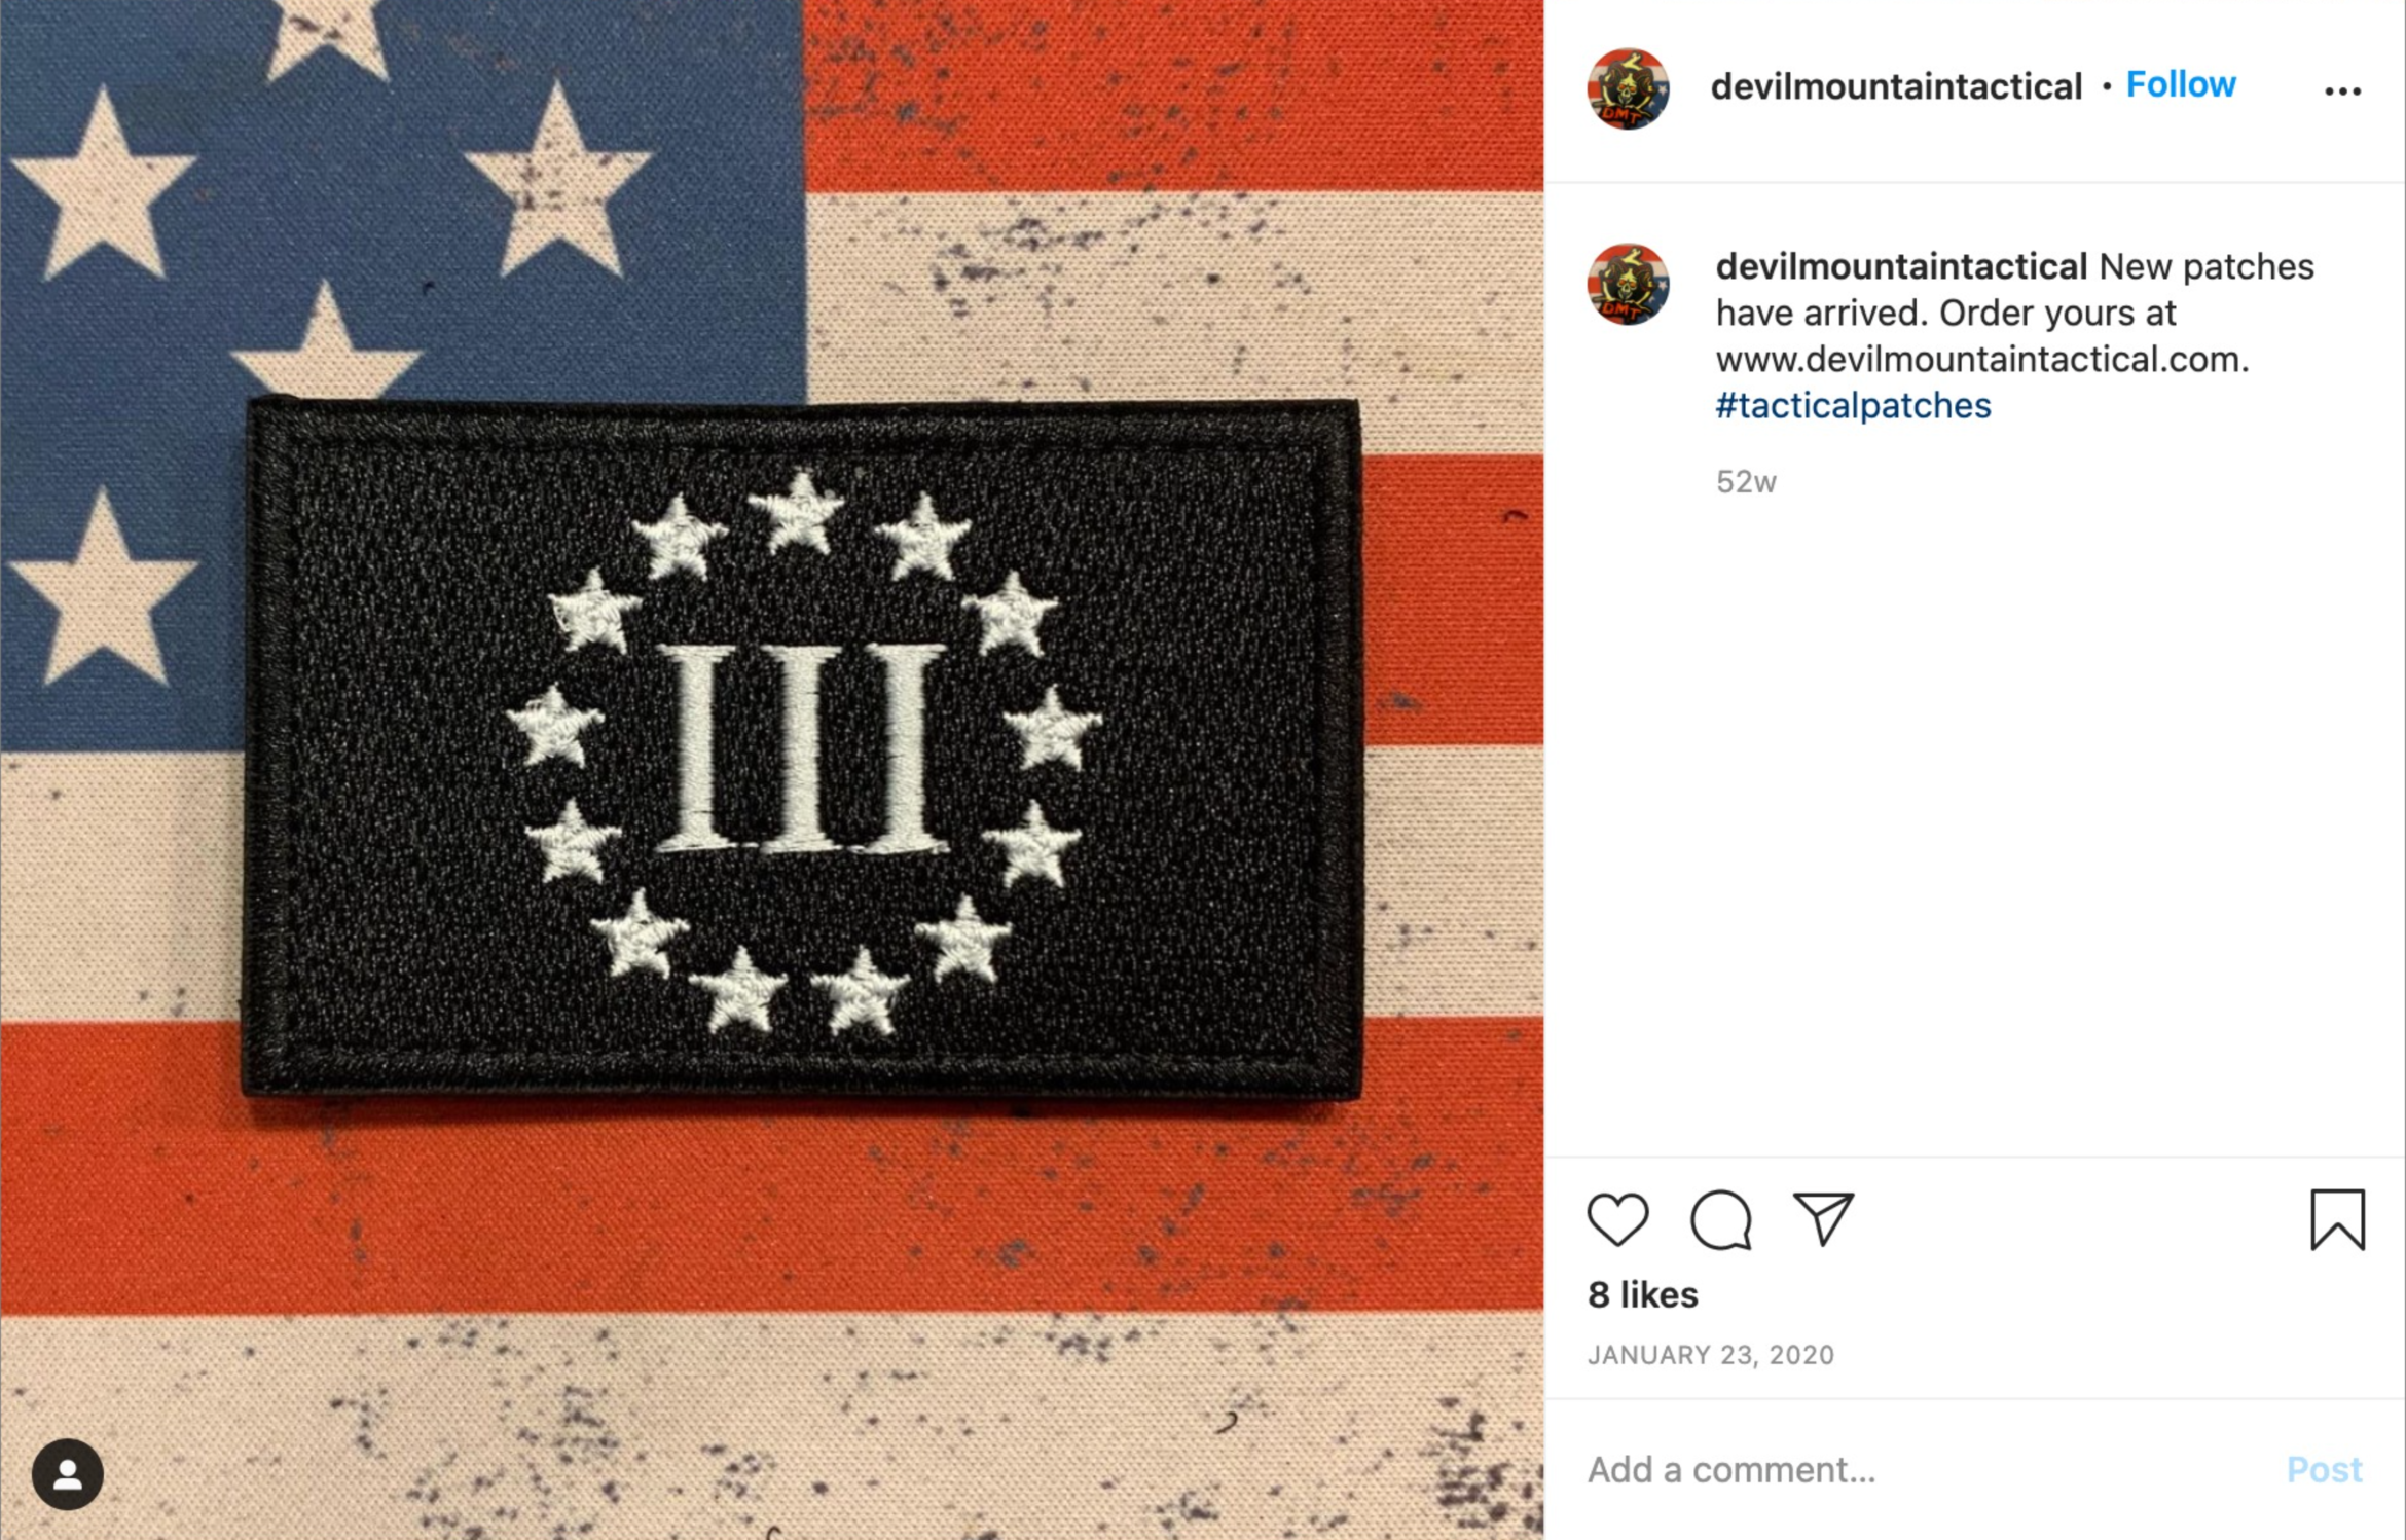 A screenshot from Instagram depicting a close-up image of a Three Percenter militia patch.